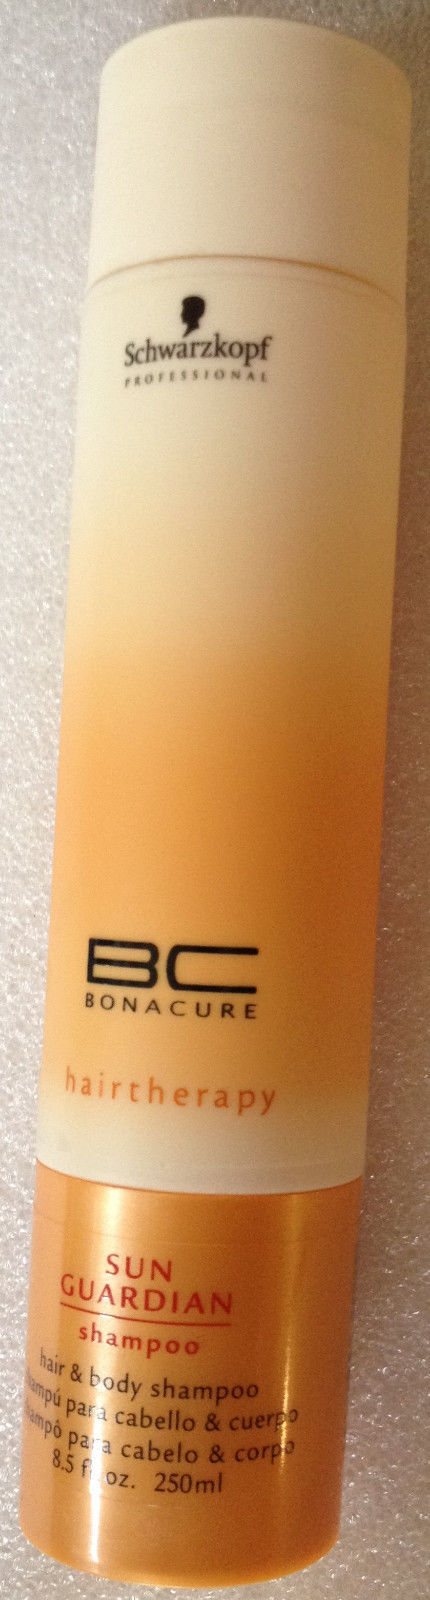 Schwarzkopf BC Bonacure SUN GUARDIAN Hair & Body Shampoo 8.5oz NEW & FRESH!